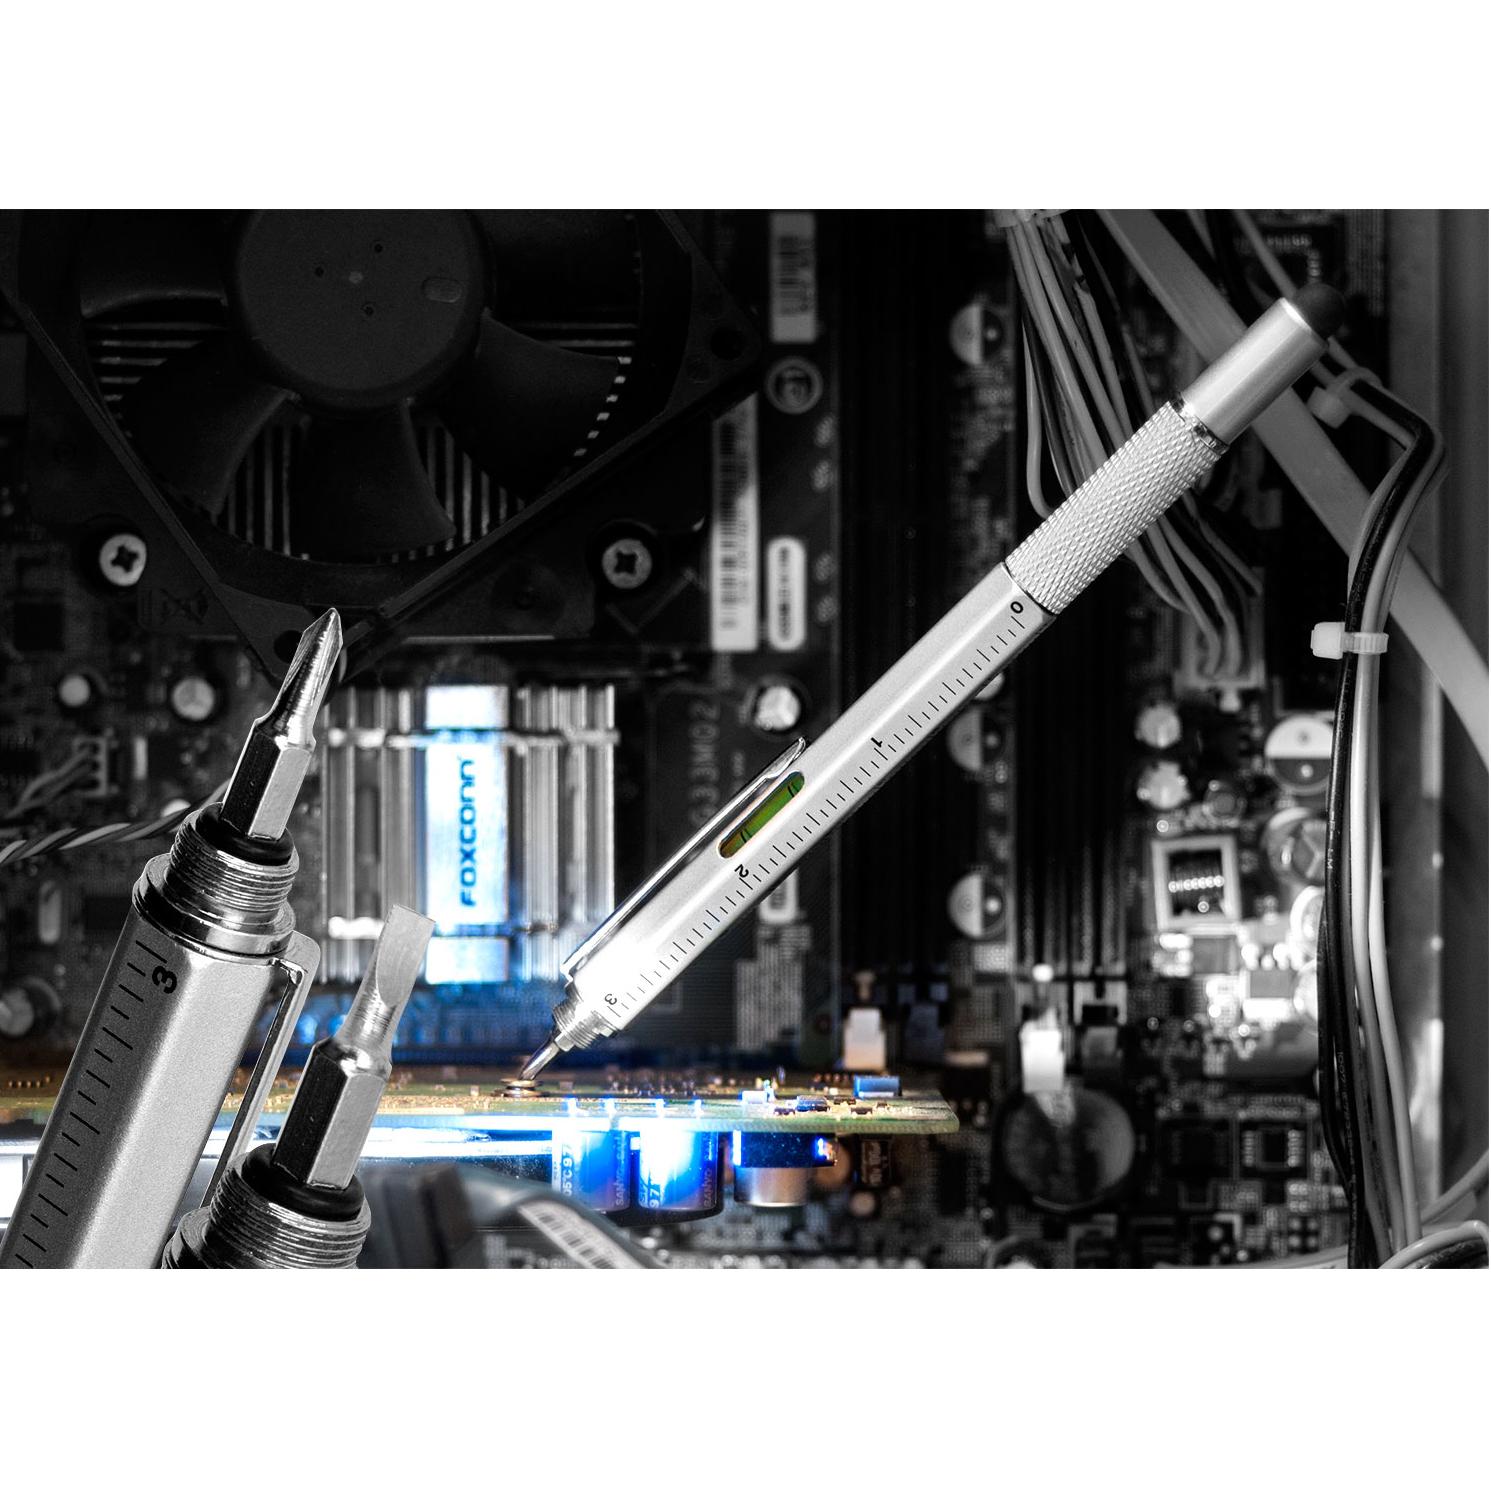 Olixar HexStyli 6 in 1 Stylus Pen - Silver